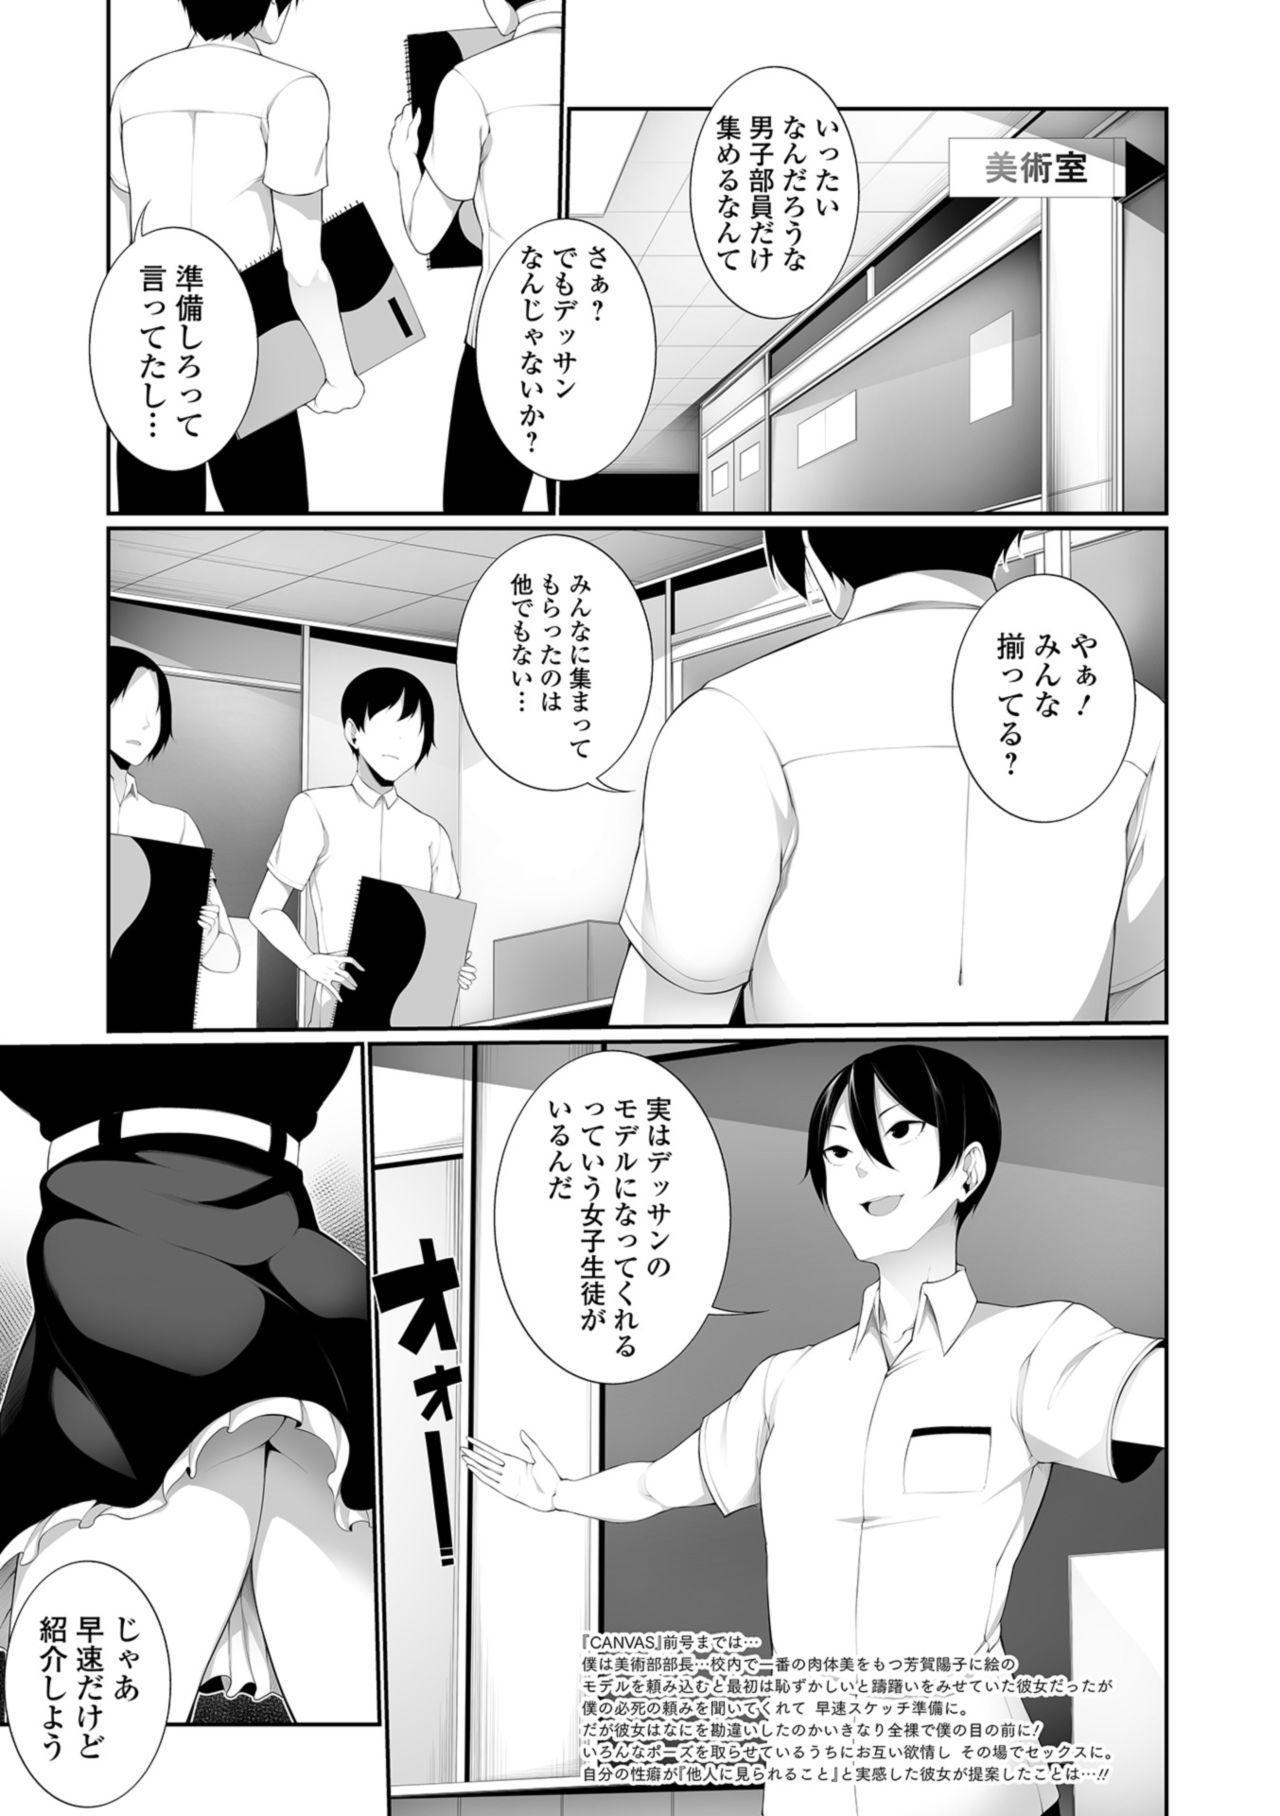 COMIC Shigekiteki SQUIRT!! Vol. 09 96